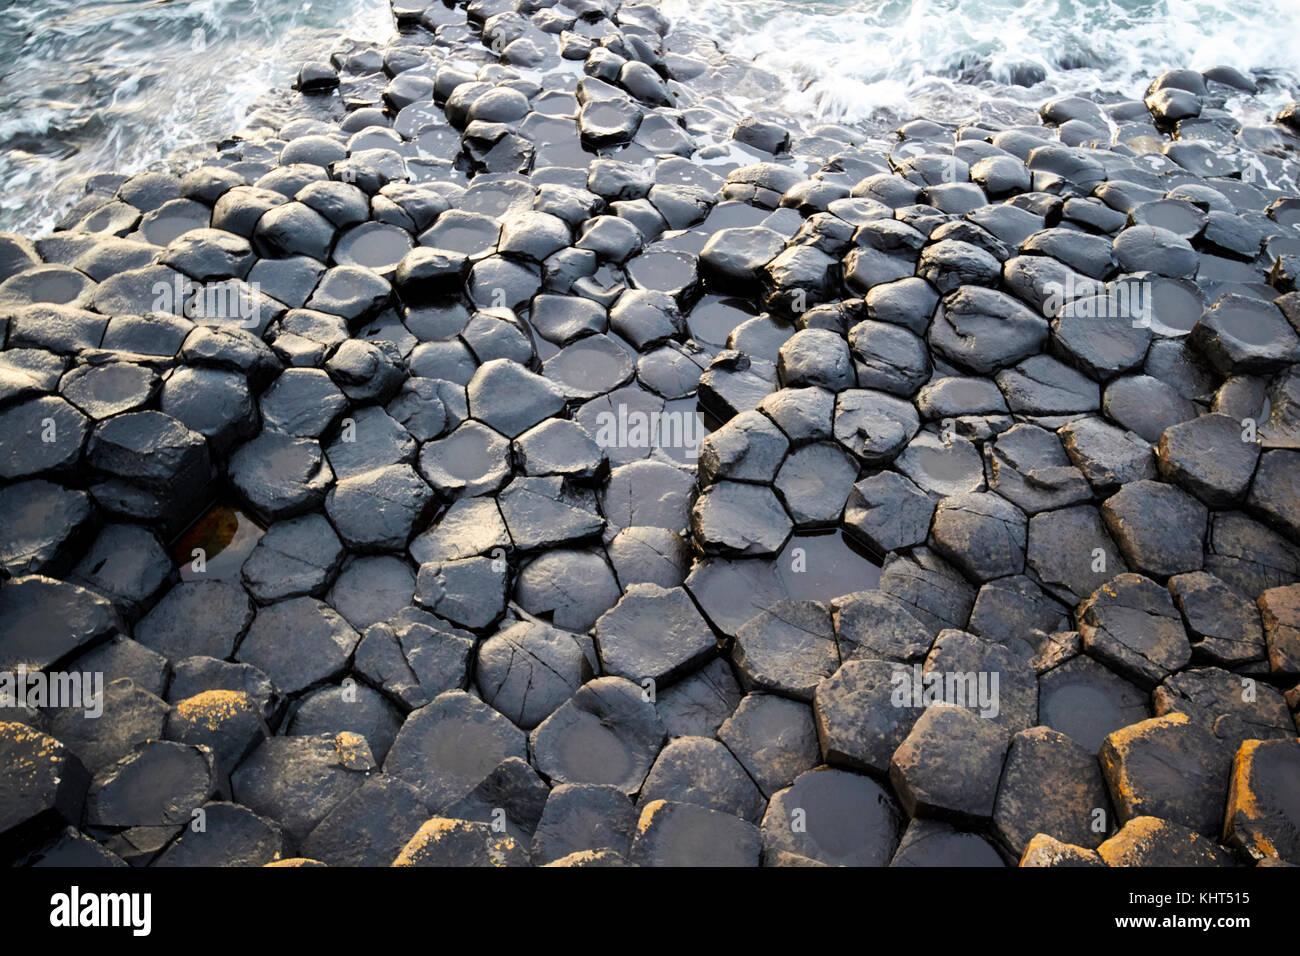 black shaped rocks near the Giants Causeway county antrim northern ireland uk - Stock Image